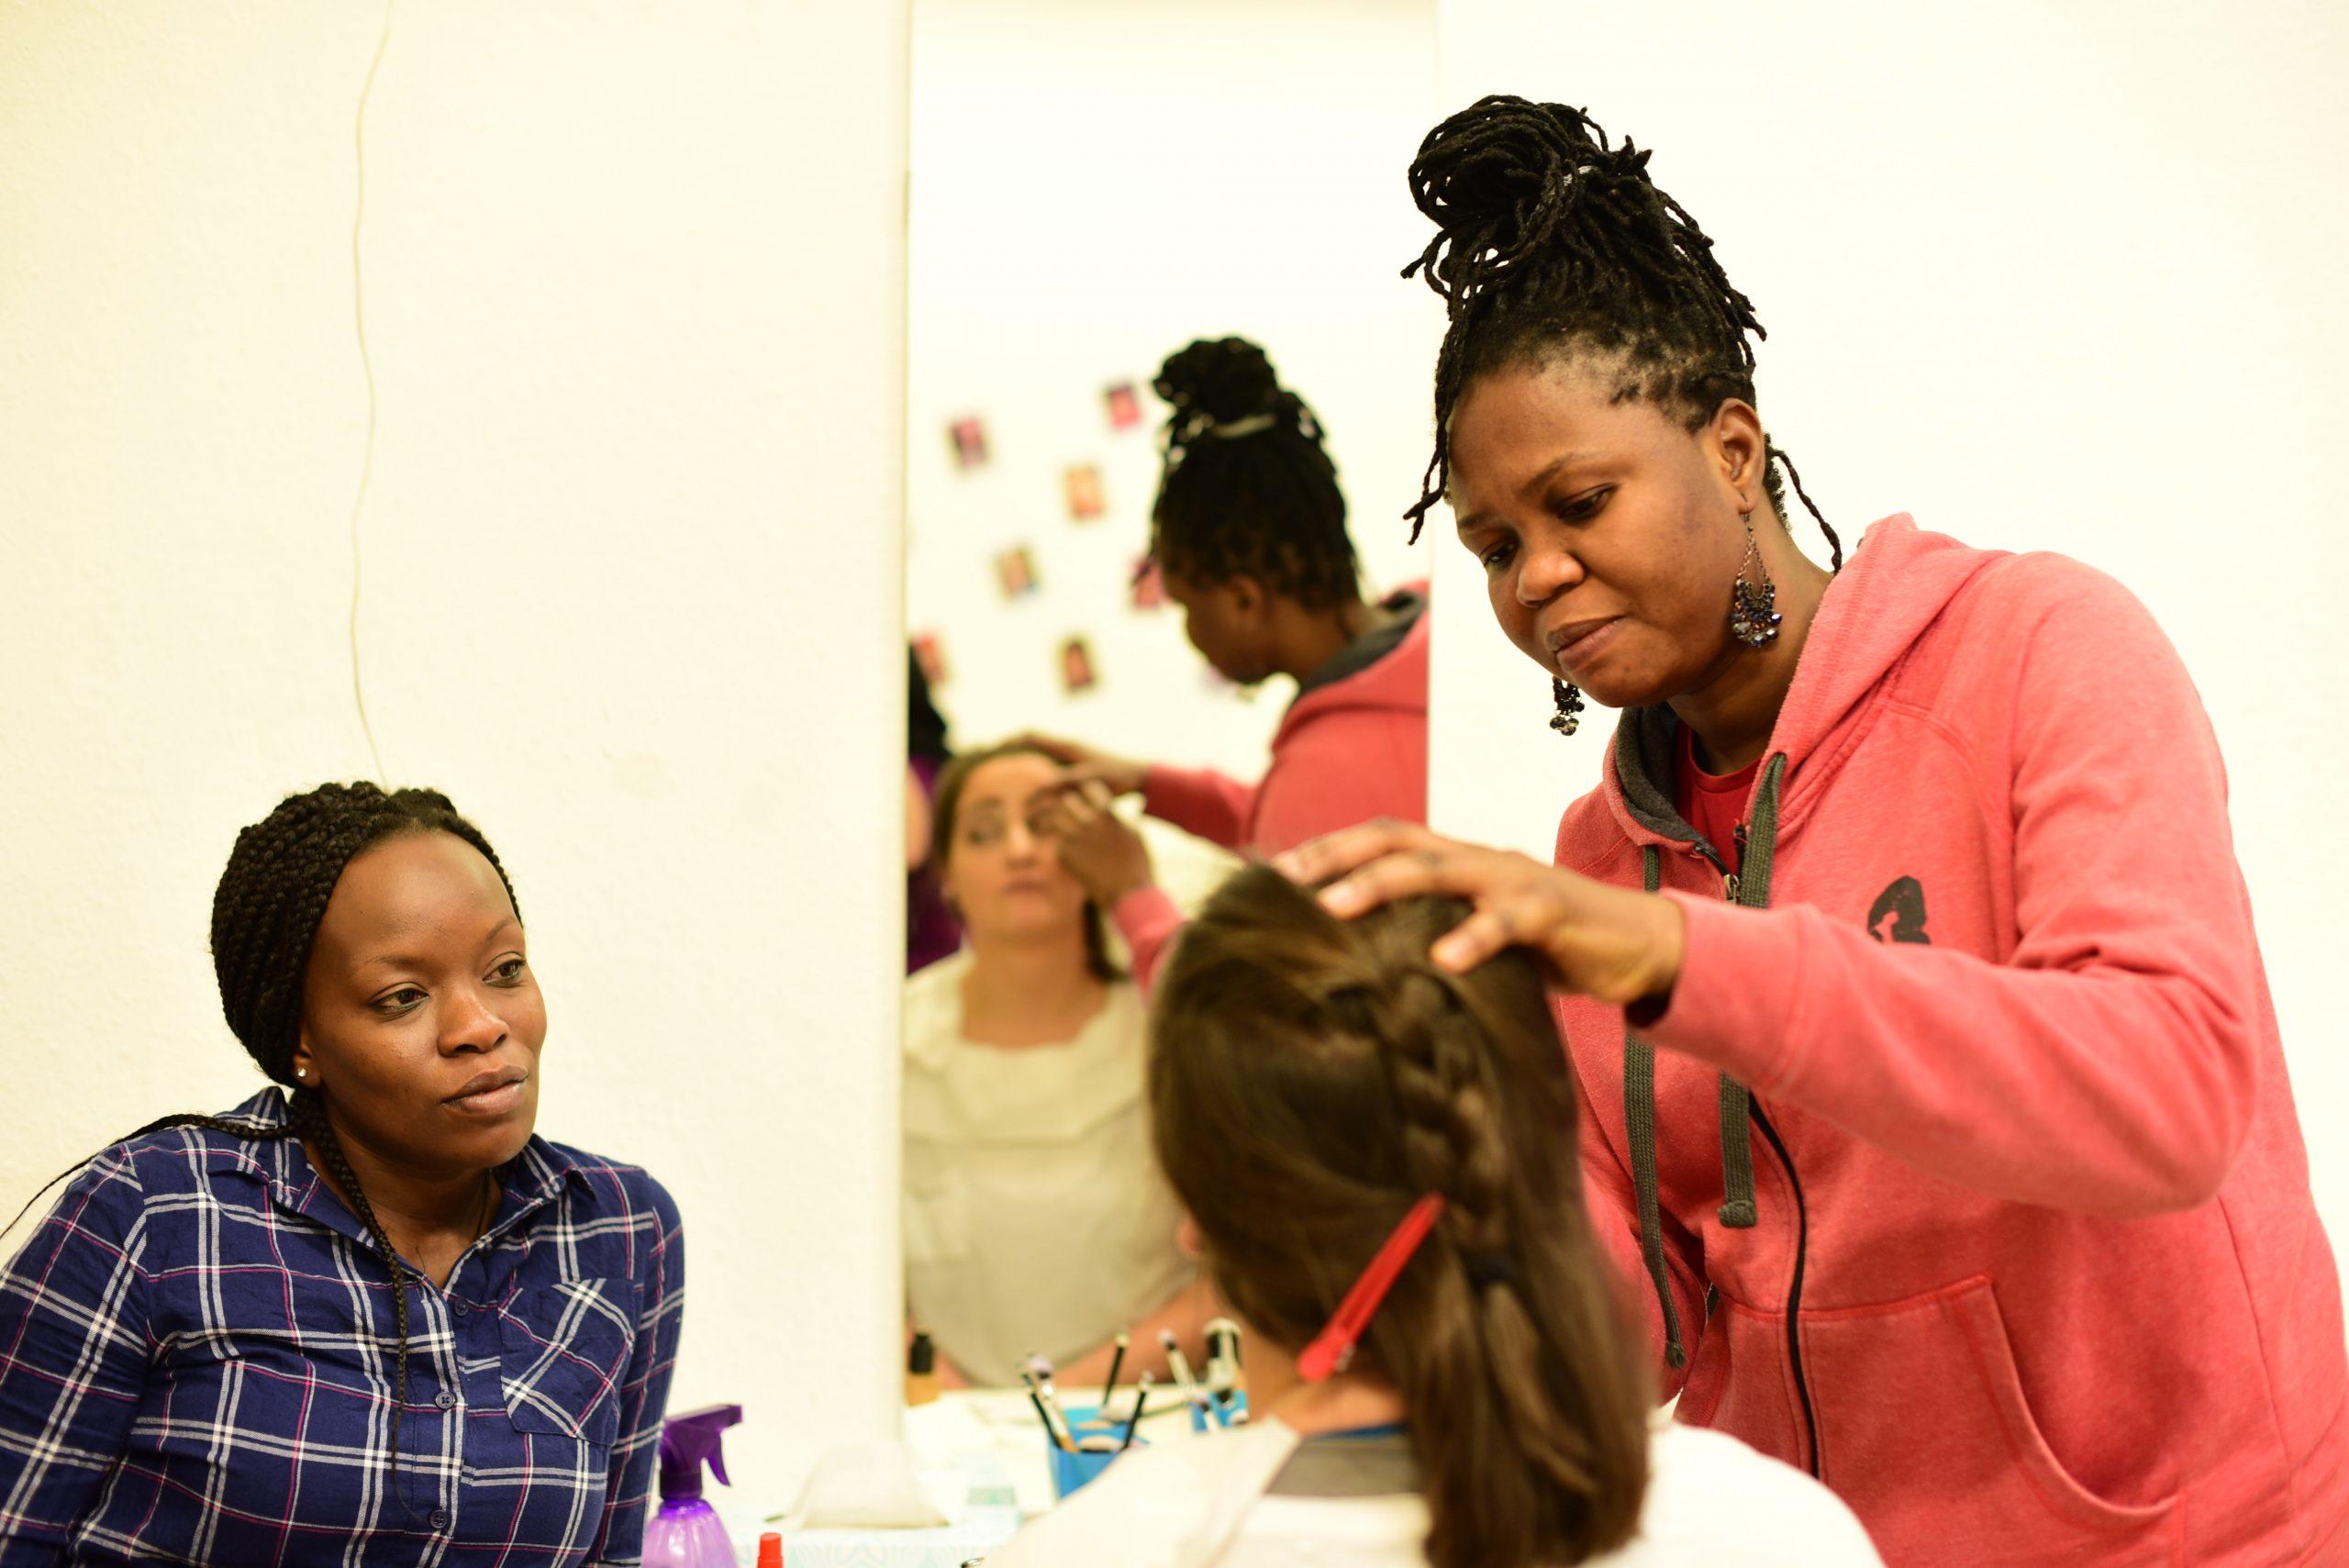 Onlinekurs: Berufsorientierung | Praxiskurs: Friseur/Kosmetik